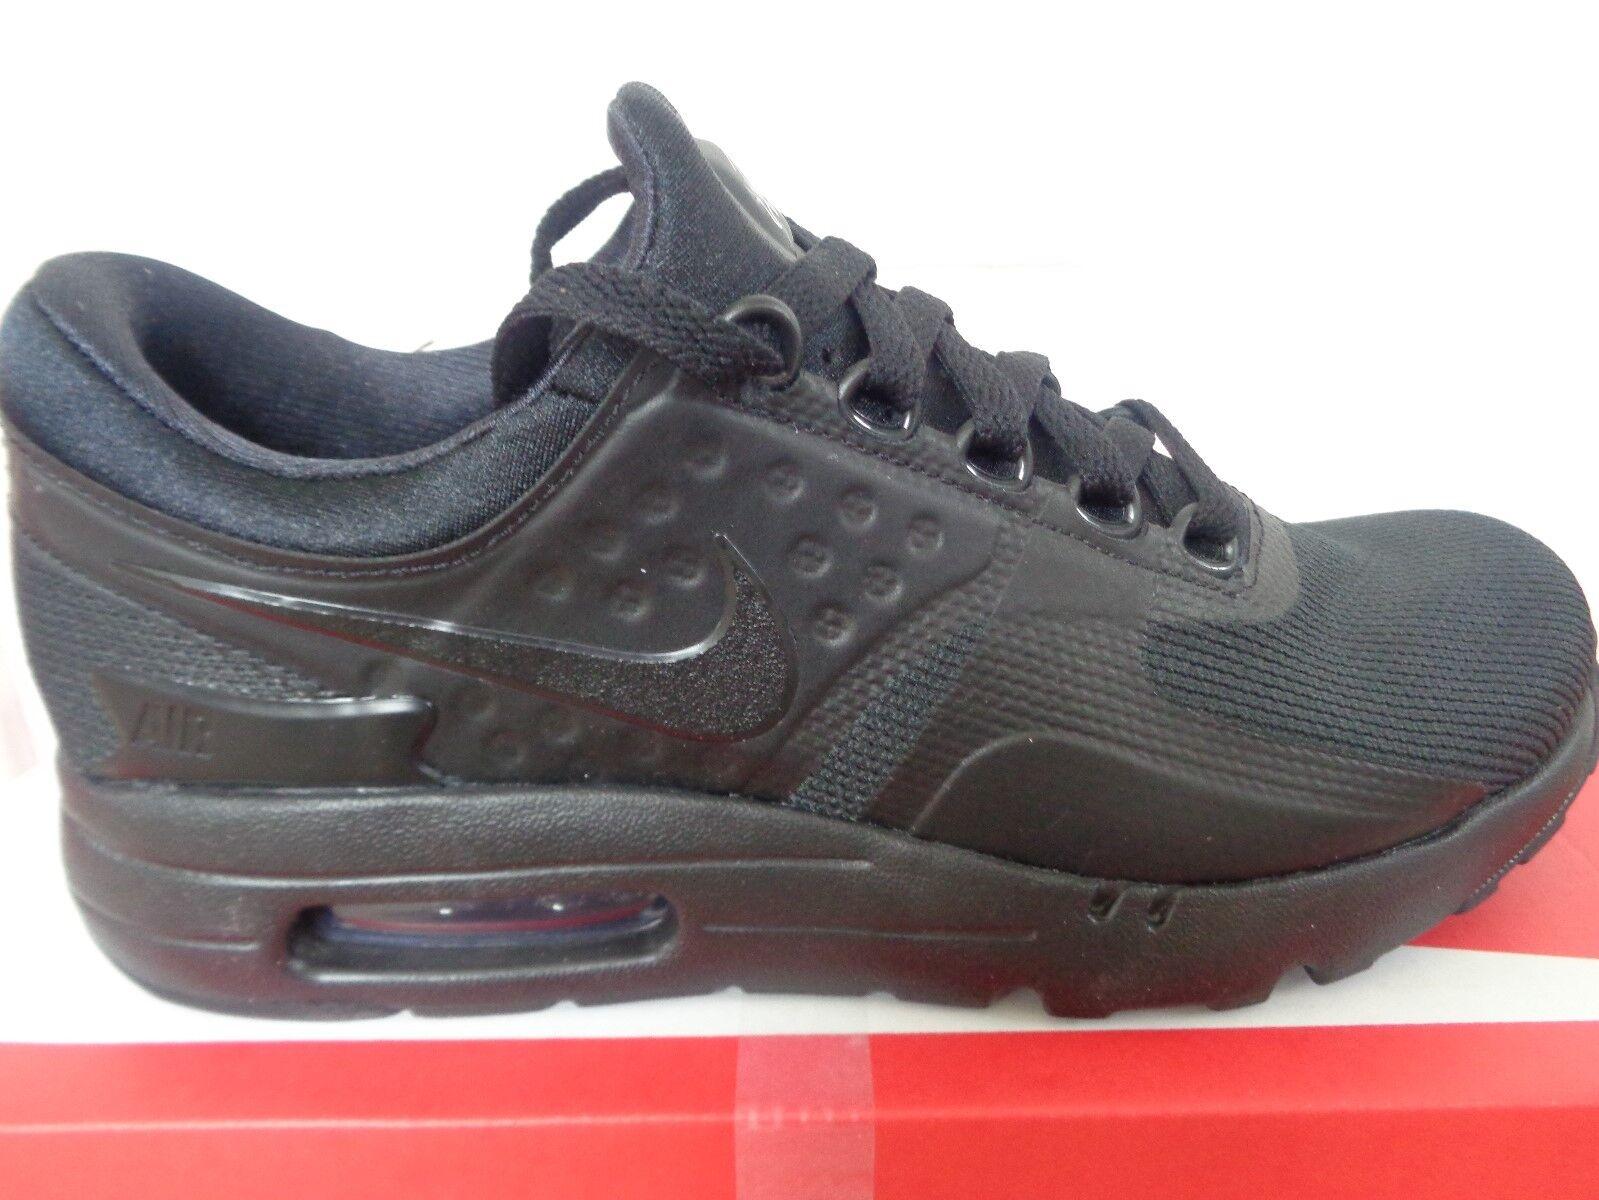 Nike Air Max Zero essential trainers shoes 876070 006 uk 9 eu 44 us 10 NEW+BOX